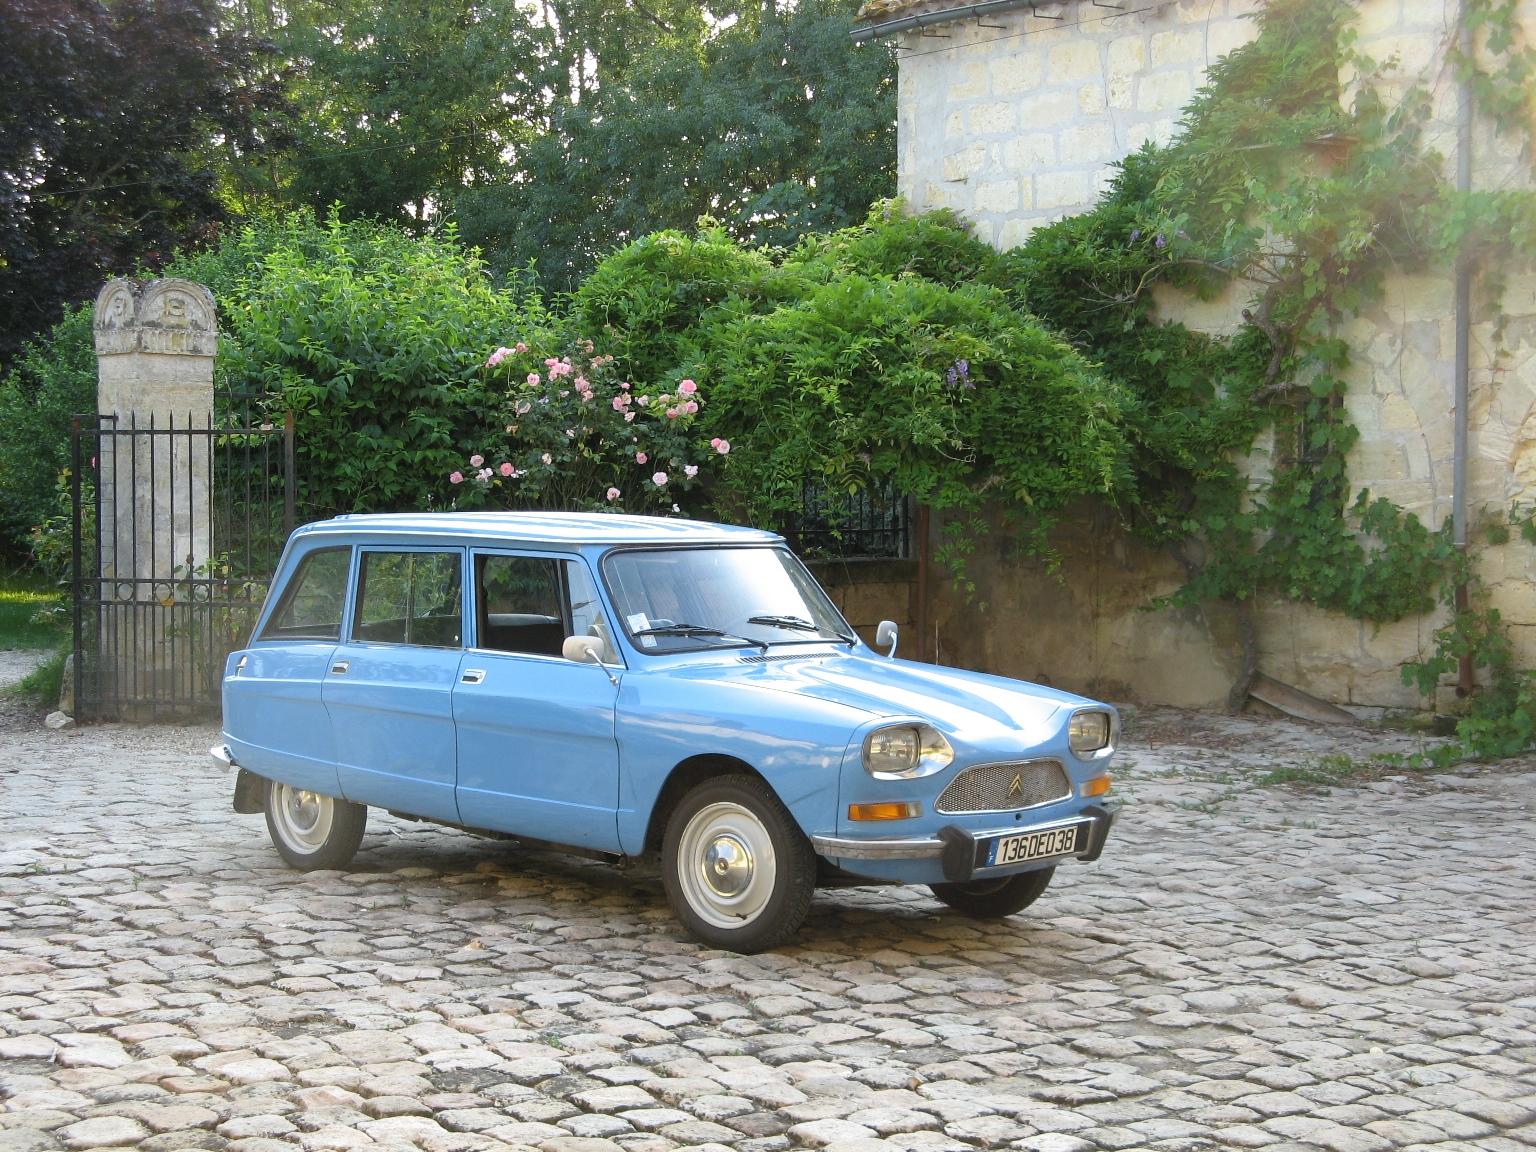 voiture a restaurer jaguar xk 150 d 39 occasion n 377 19000e voitures a voiture americaine a. Black Bedroom Furniture Sets. Home Design Ideas